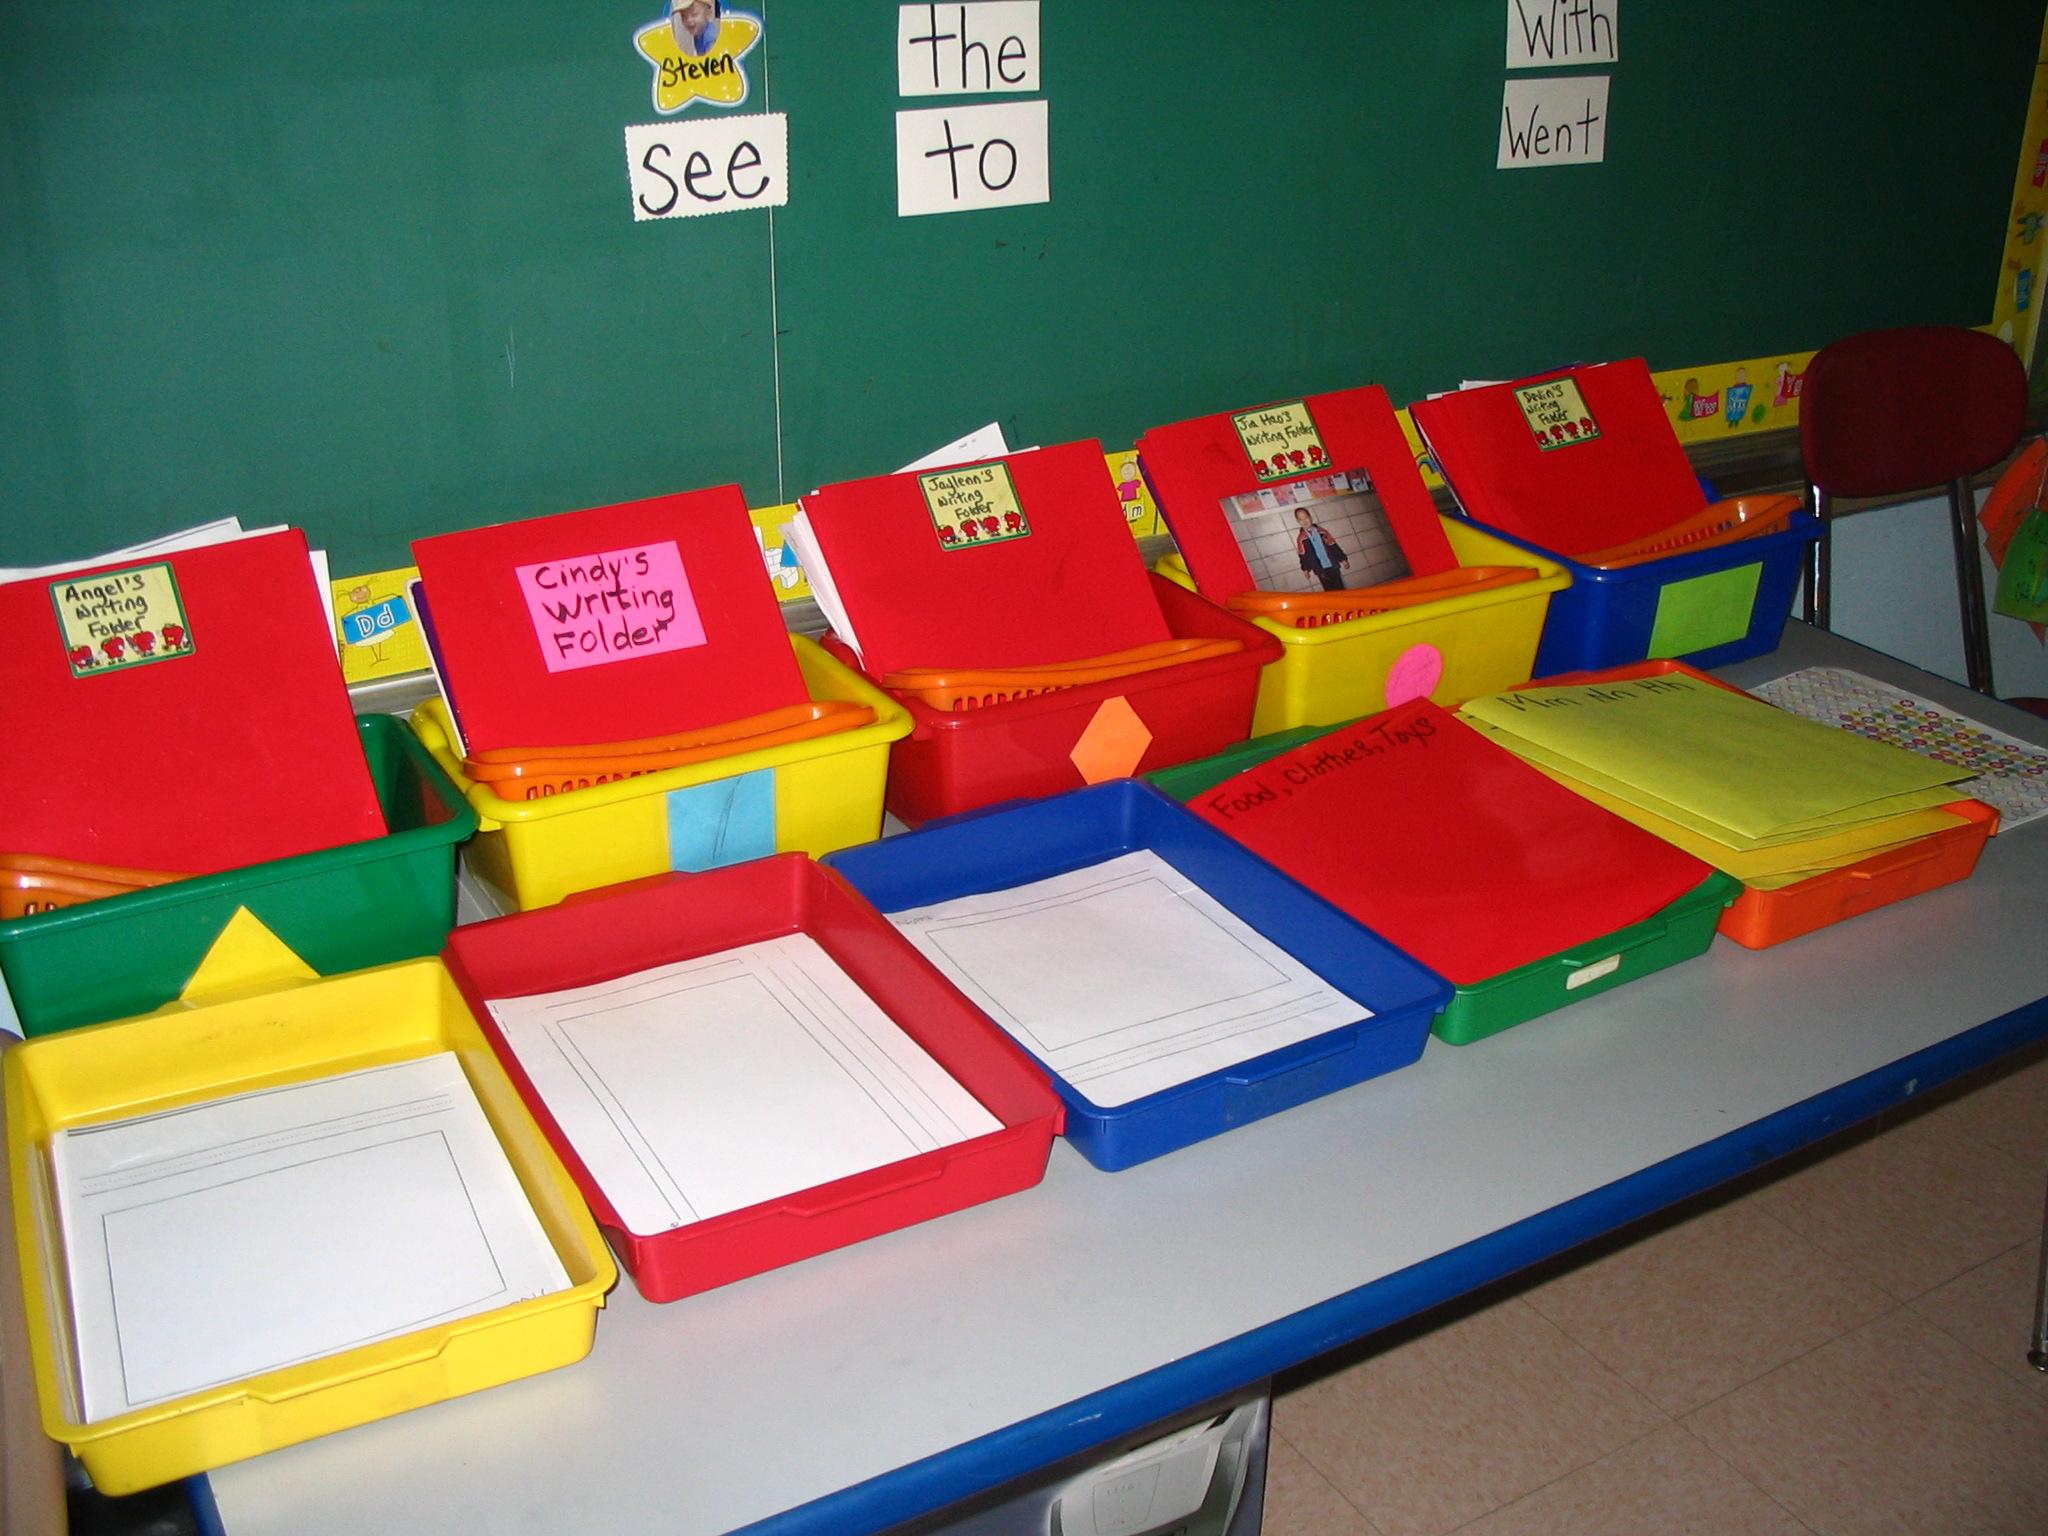 Writing folders (K-2)